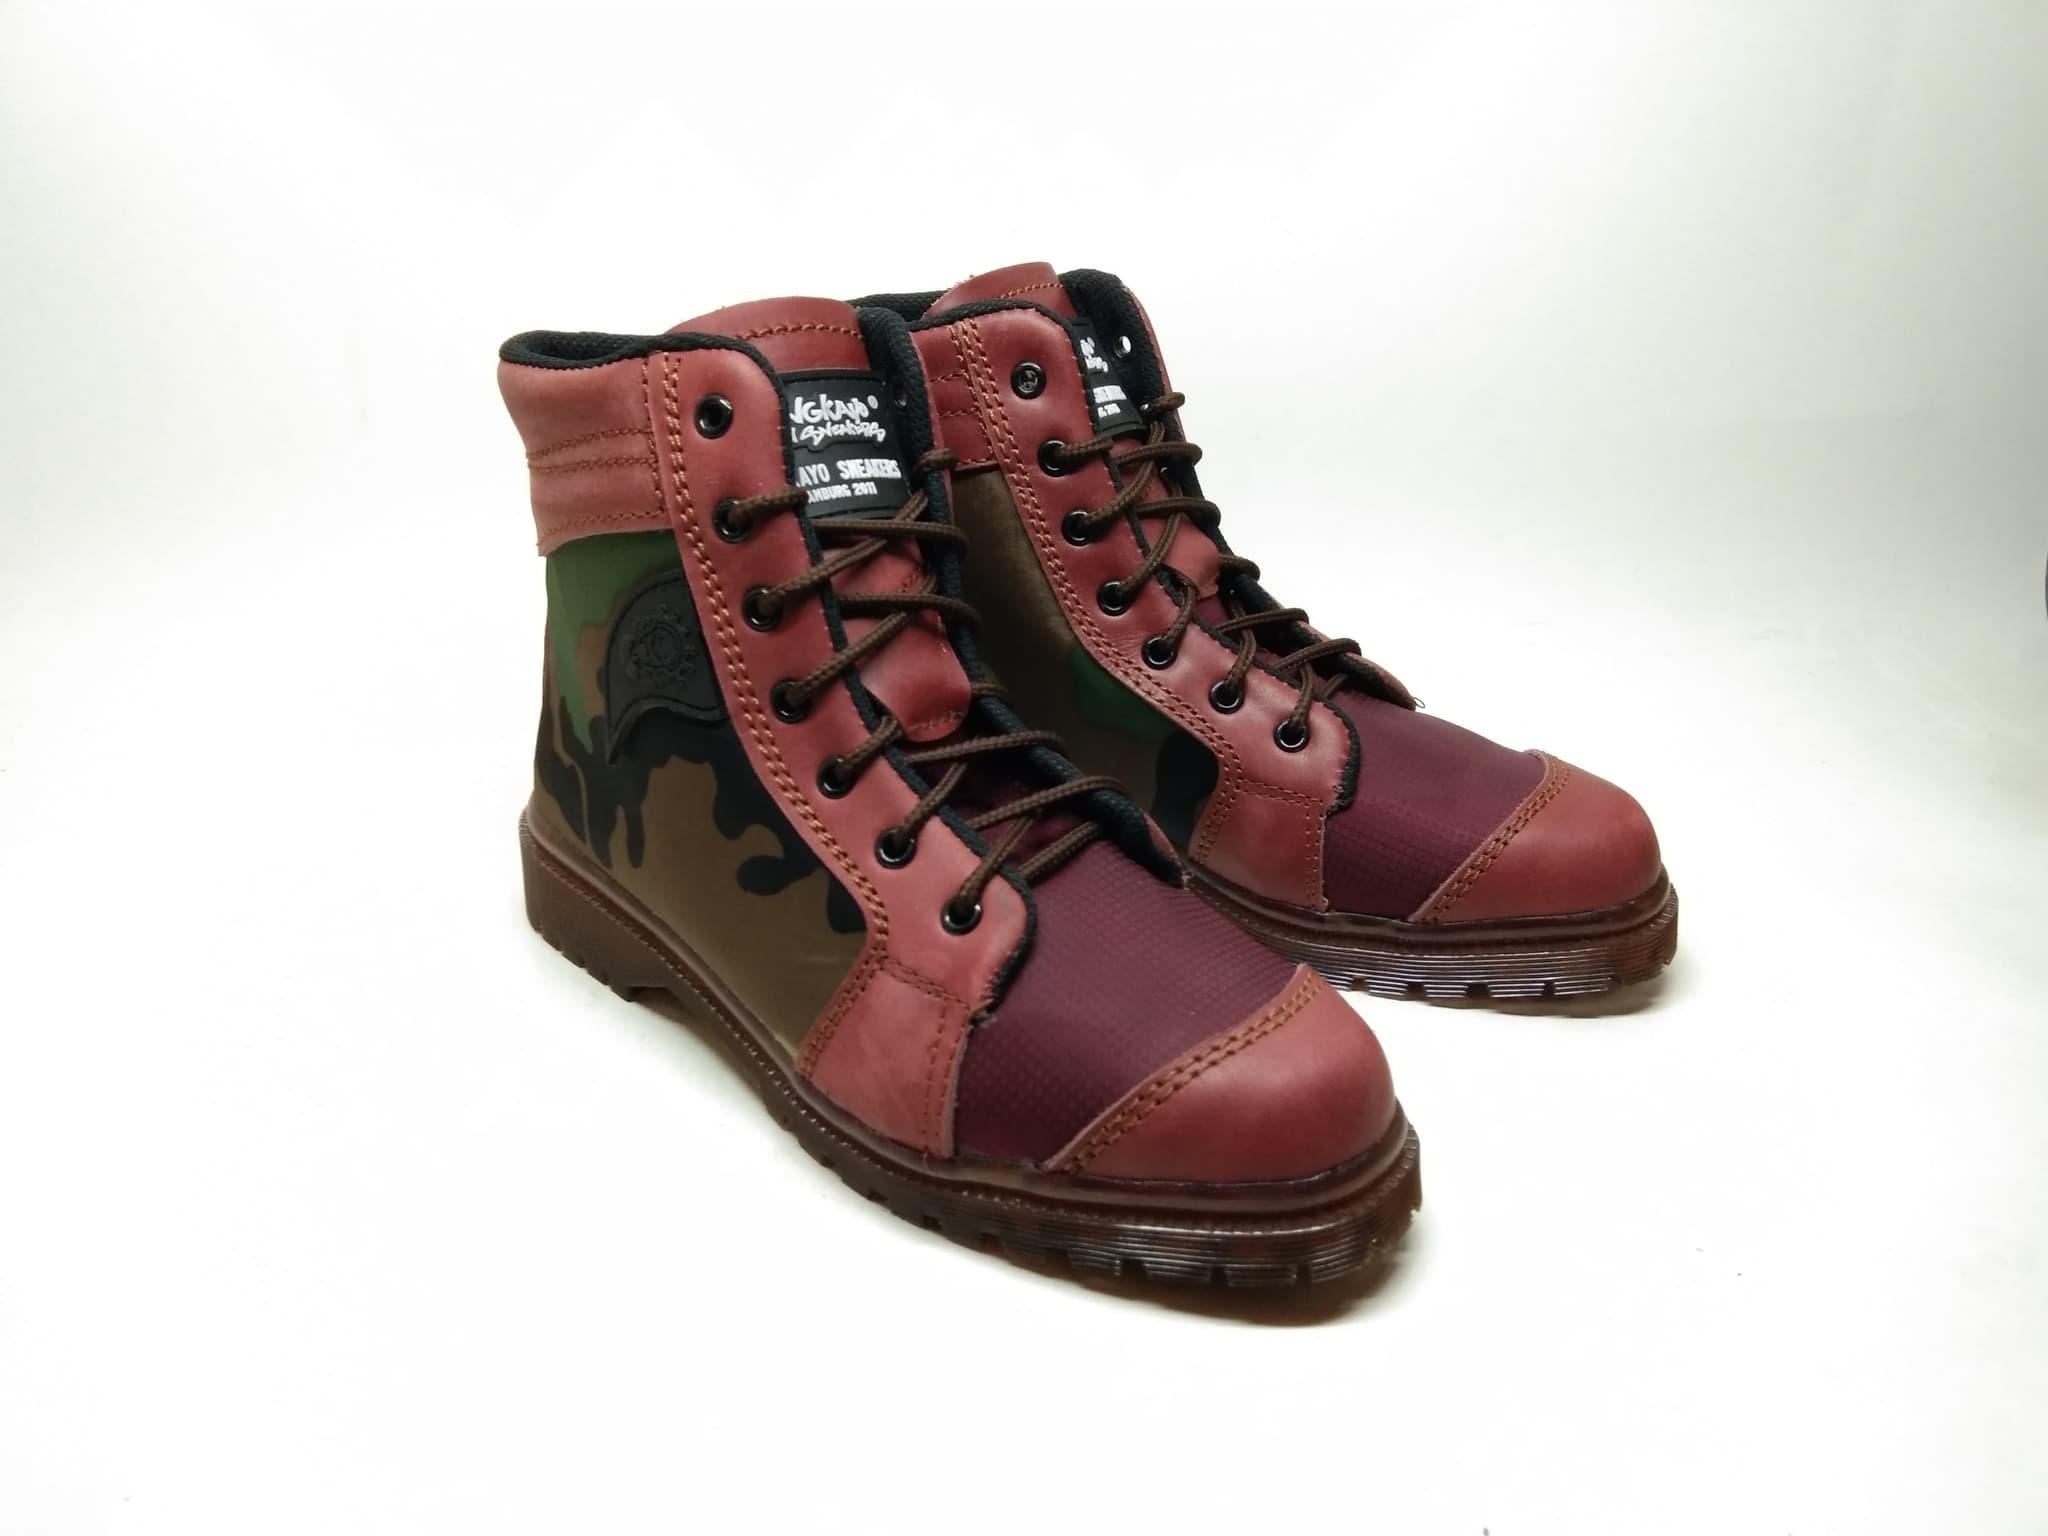 9d001b5334a91 Sepatu cewek wanita size 39 maroon motif loreng ankle boots sneakers